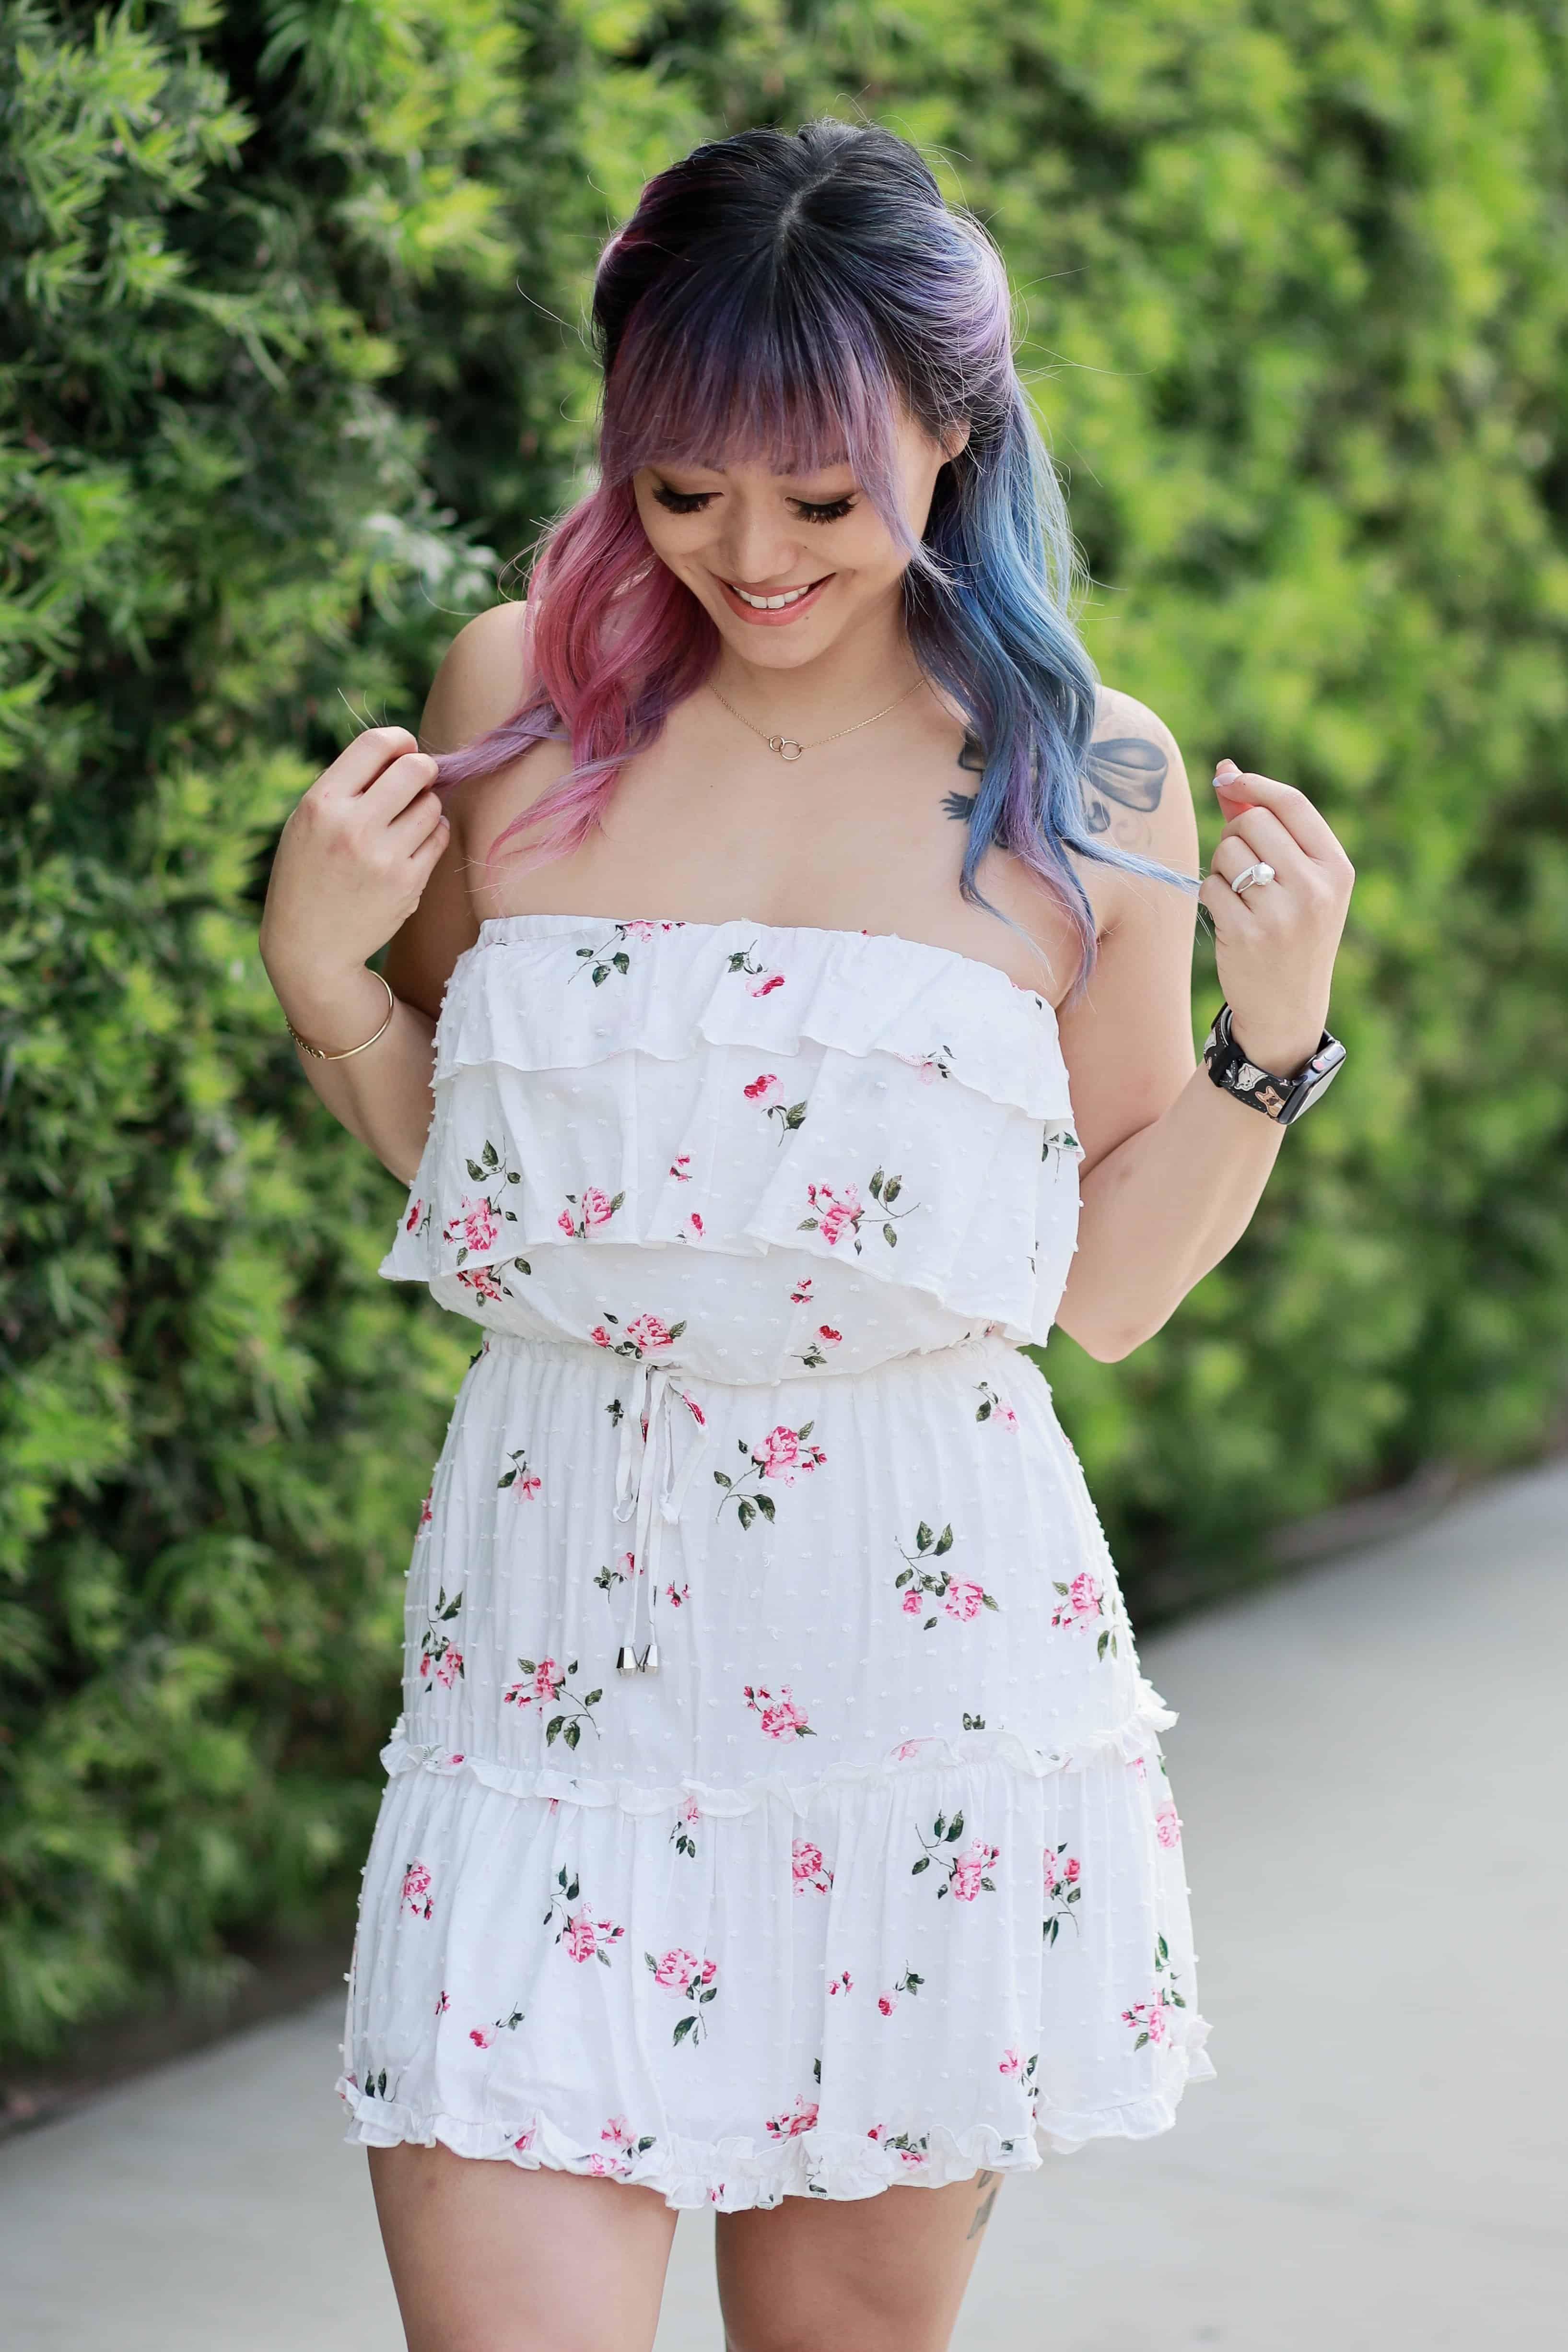 Cynthia Leu Carefree Strapless Tube Dress Off White Large In 2021 Strapless Tube Dress Strapless Summer Dress Tube Dress [ 4904 x 3270 Pixel ]